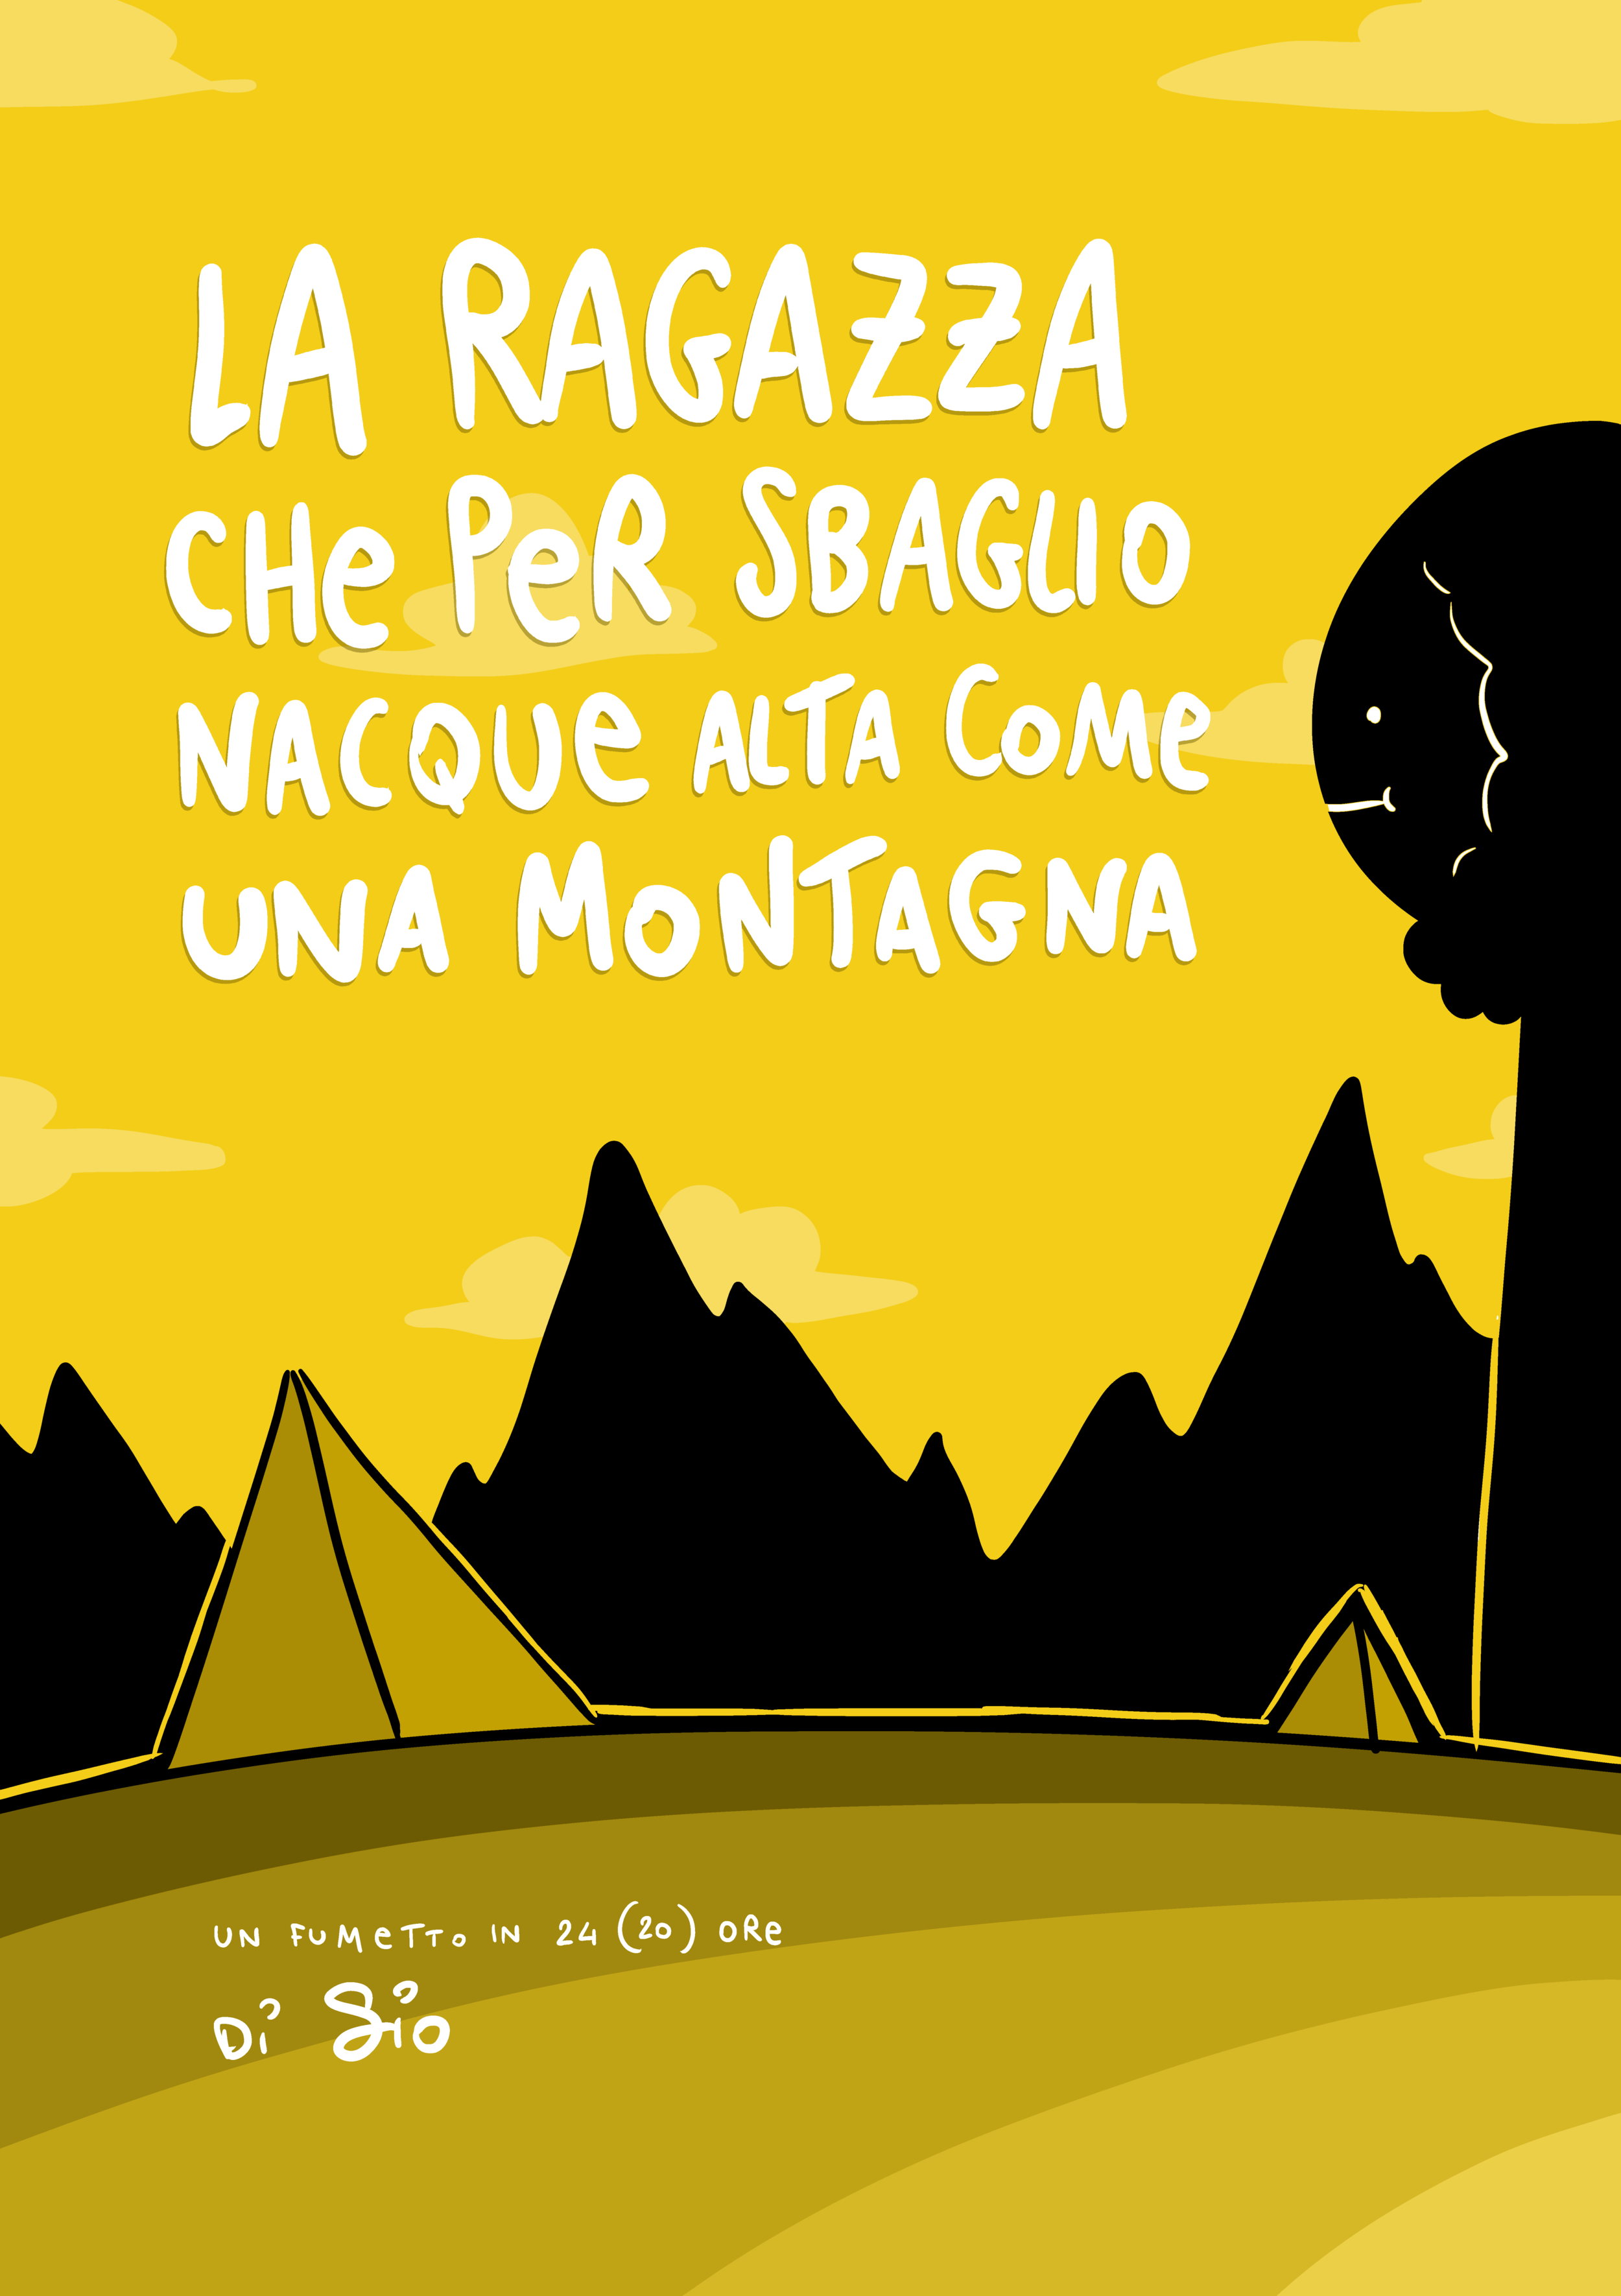 RagazzaMontagna_001.png